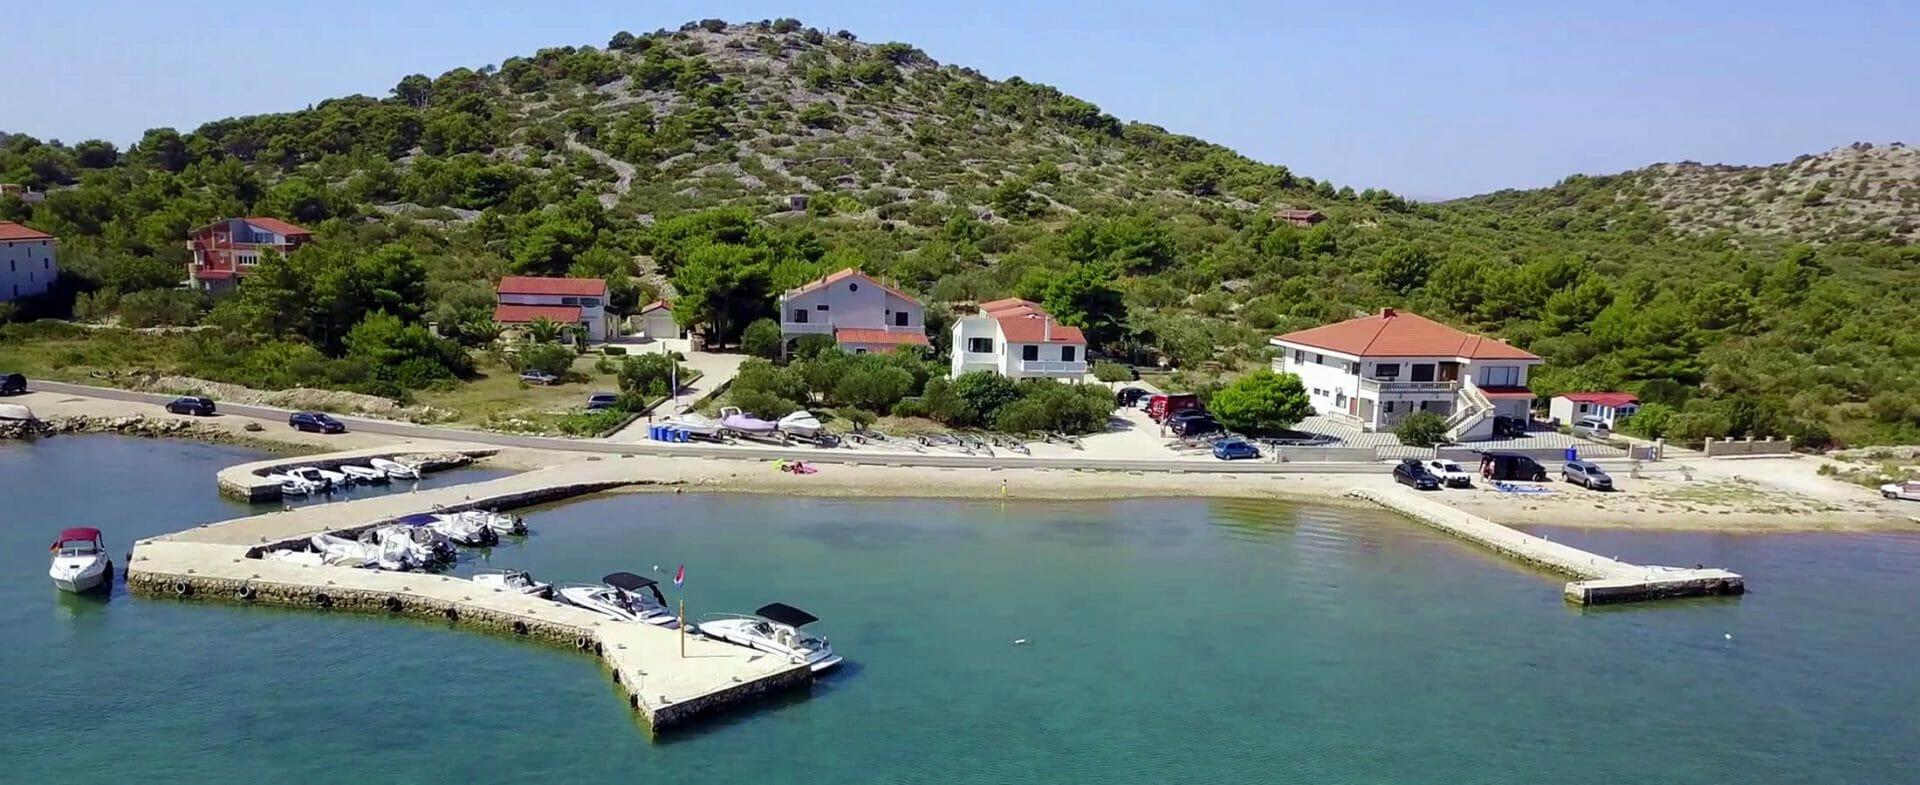 Kroatien Apartment mit Bootsliegeplatz Vila Petra